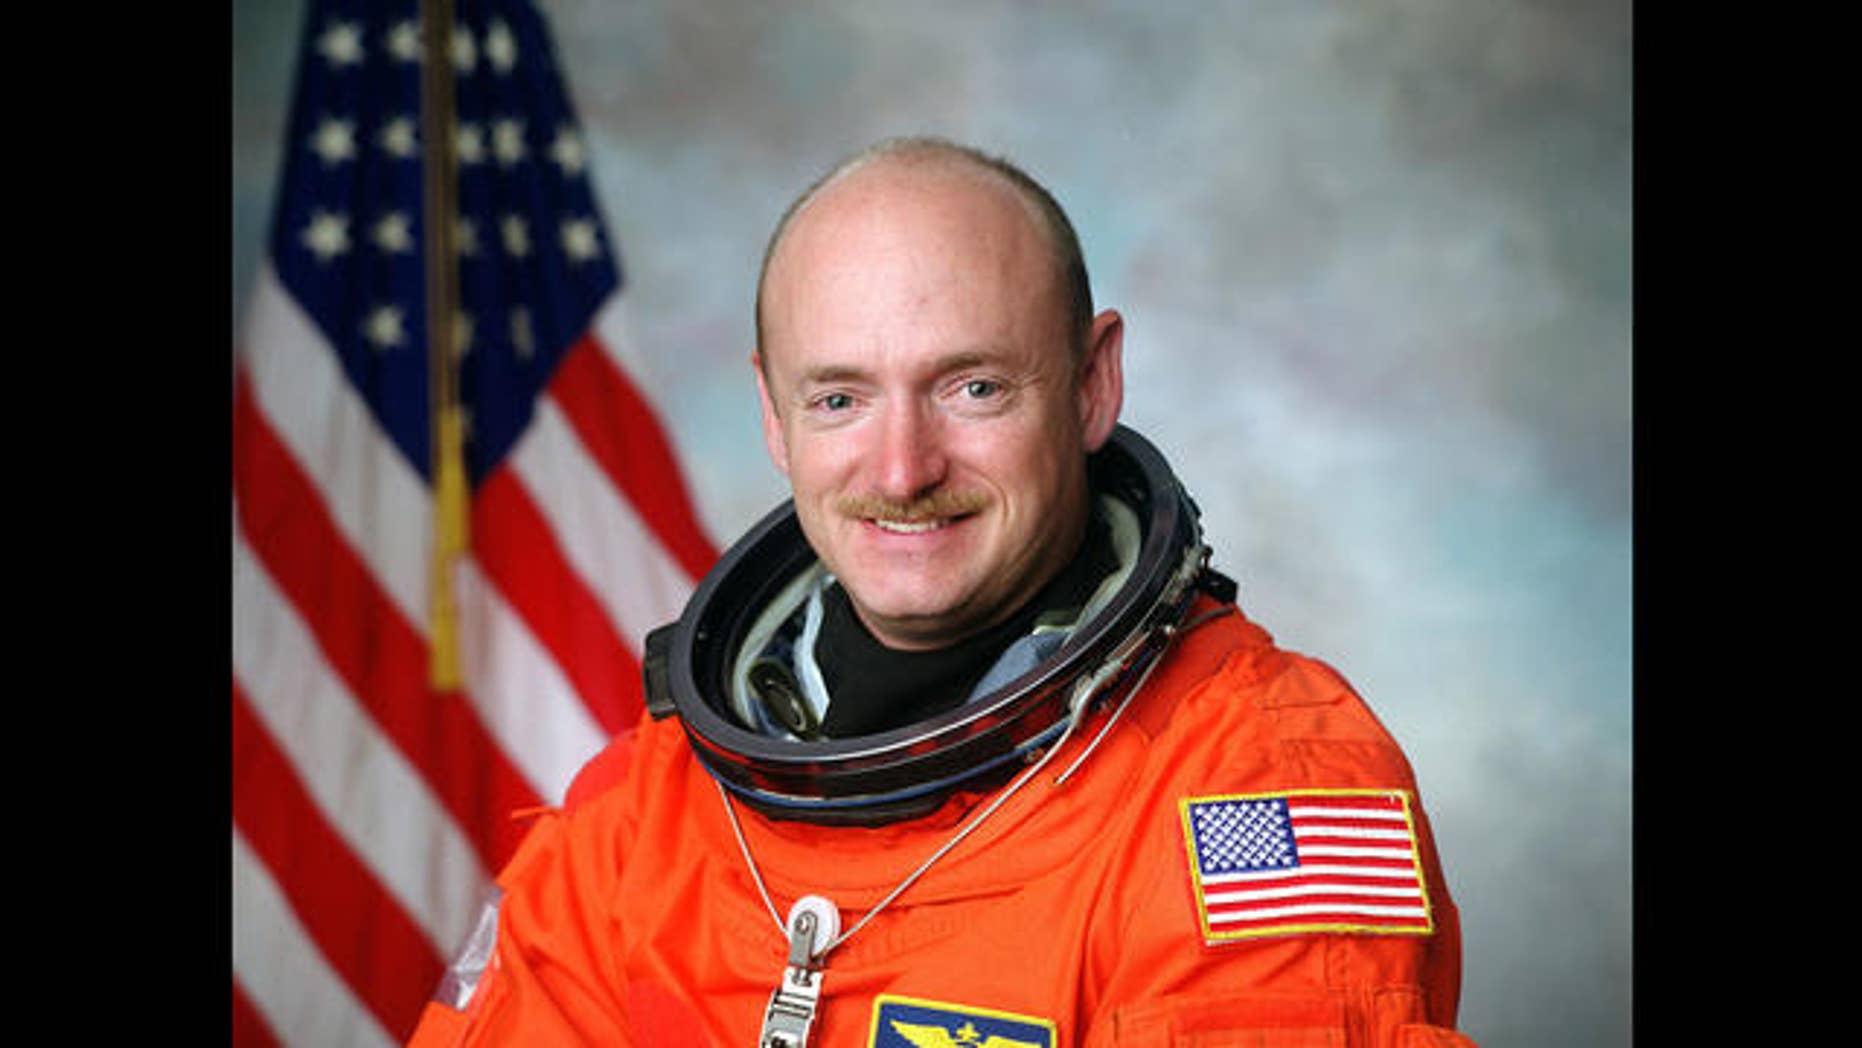 Astronaut Mark Kelly is the husband of Arizona Congressman Gabrielle Giffords.